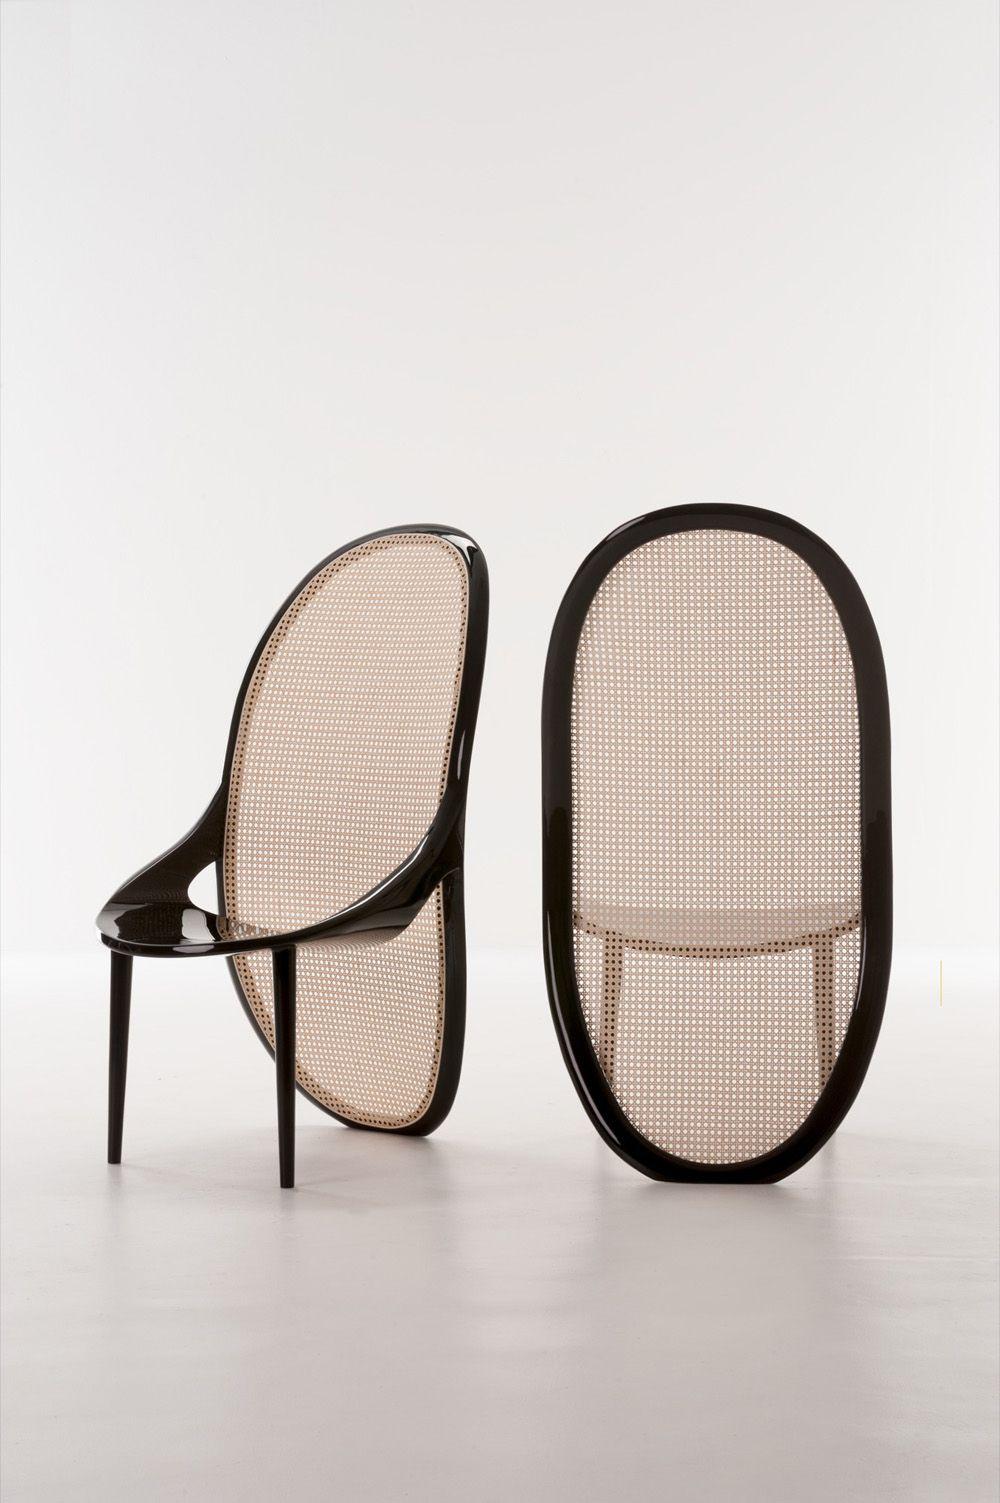 wiener chair gabriella asztalos Simplicity of a Design classic with ...